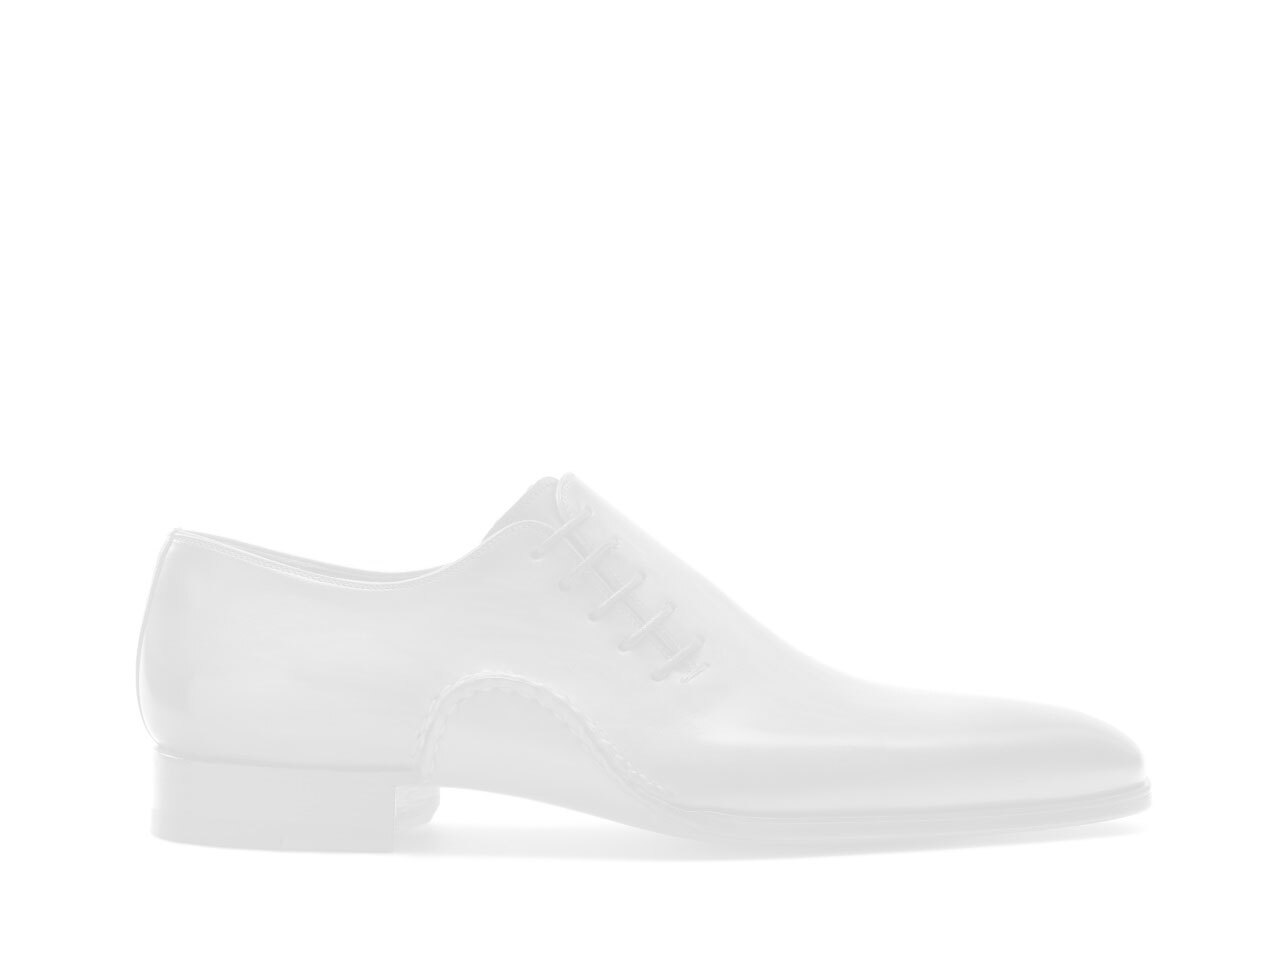 Pair of the Magnanni Richards Cuero Men's Tassel Loafers